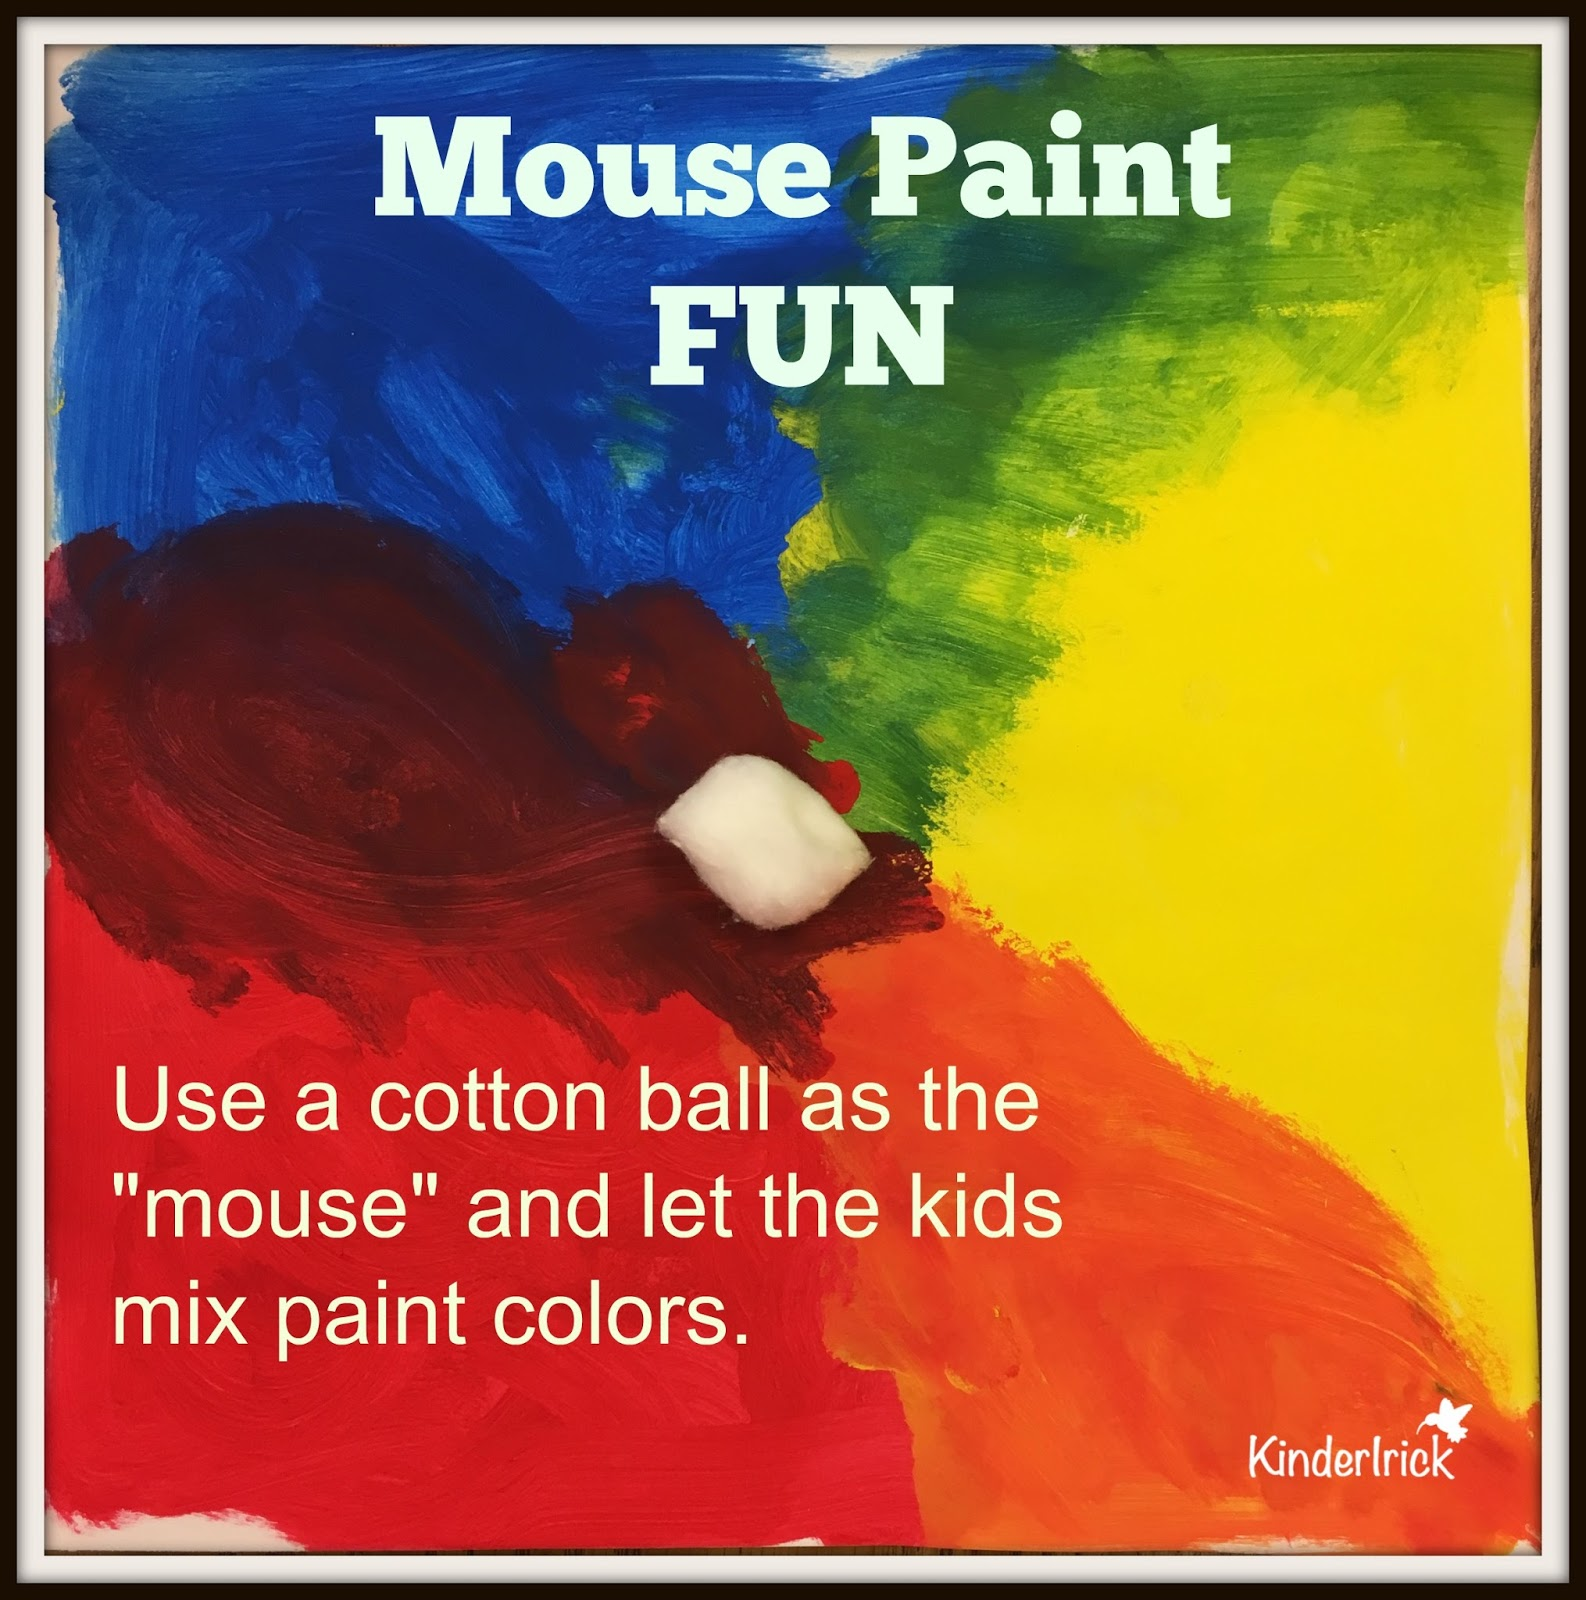 Mouse Paint Fun